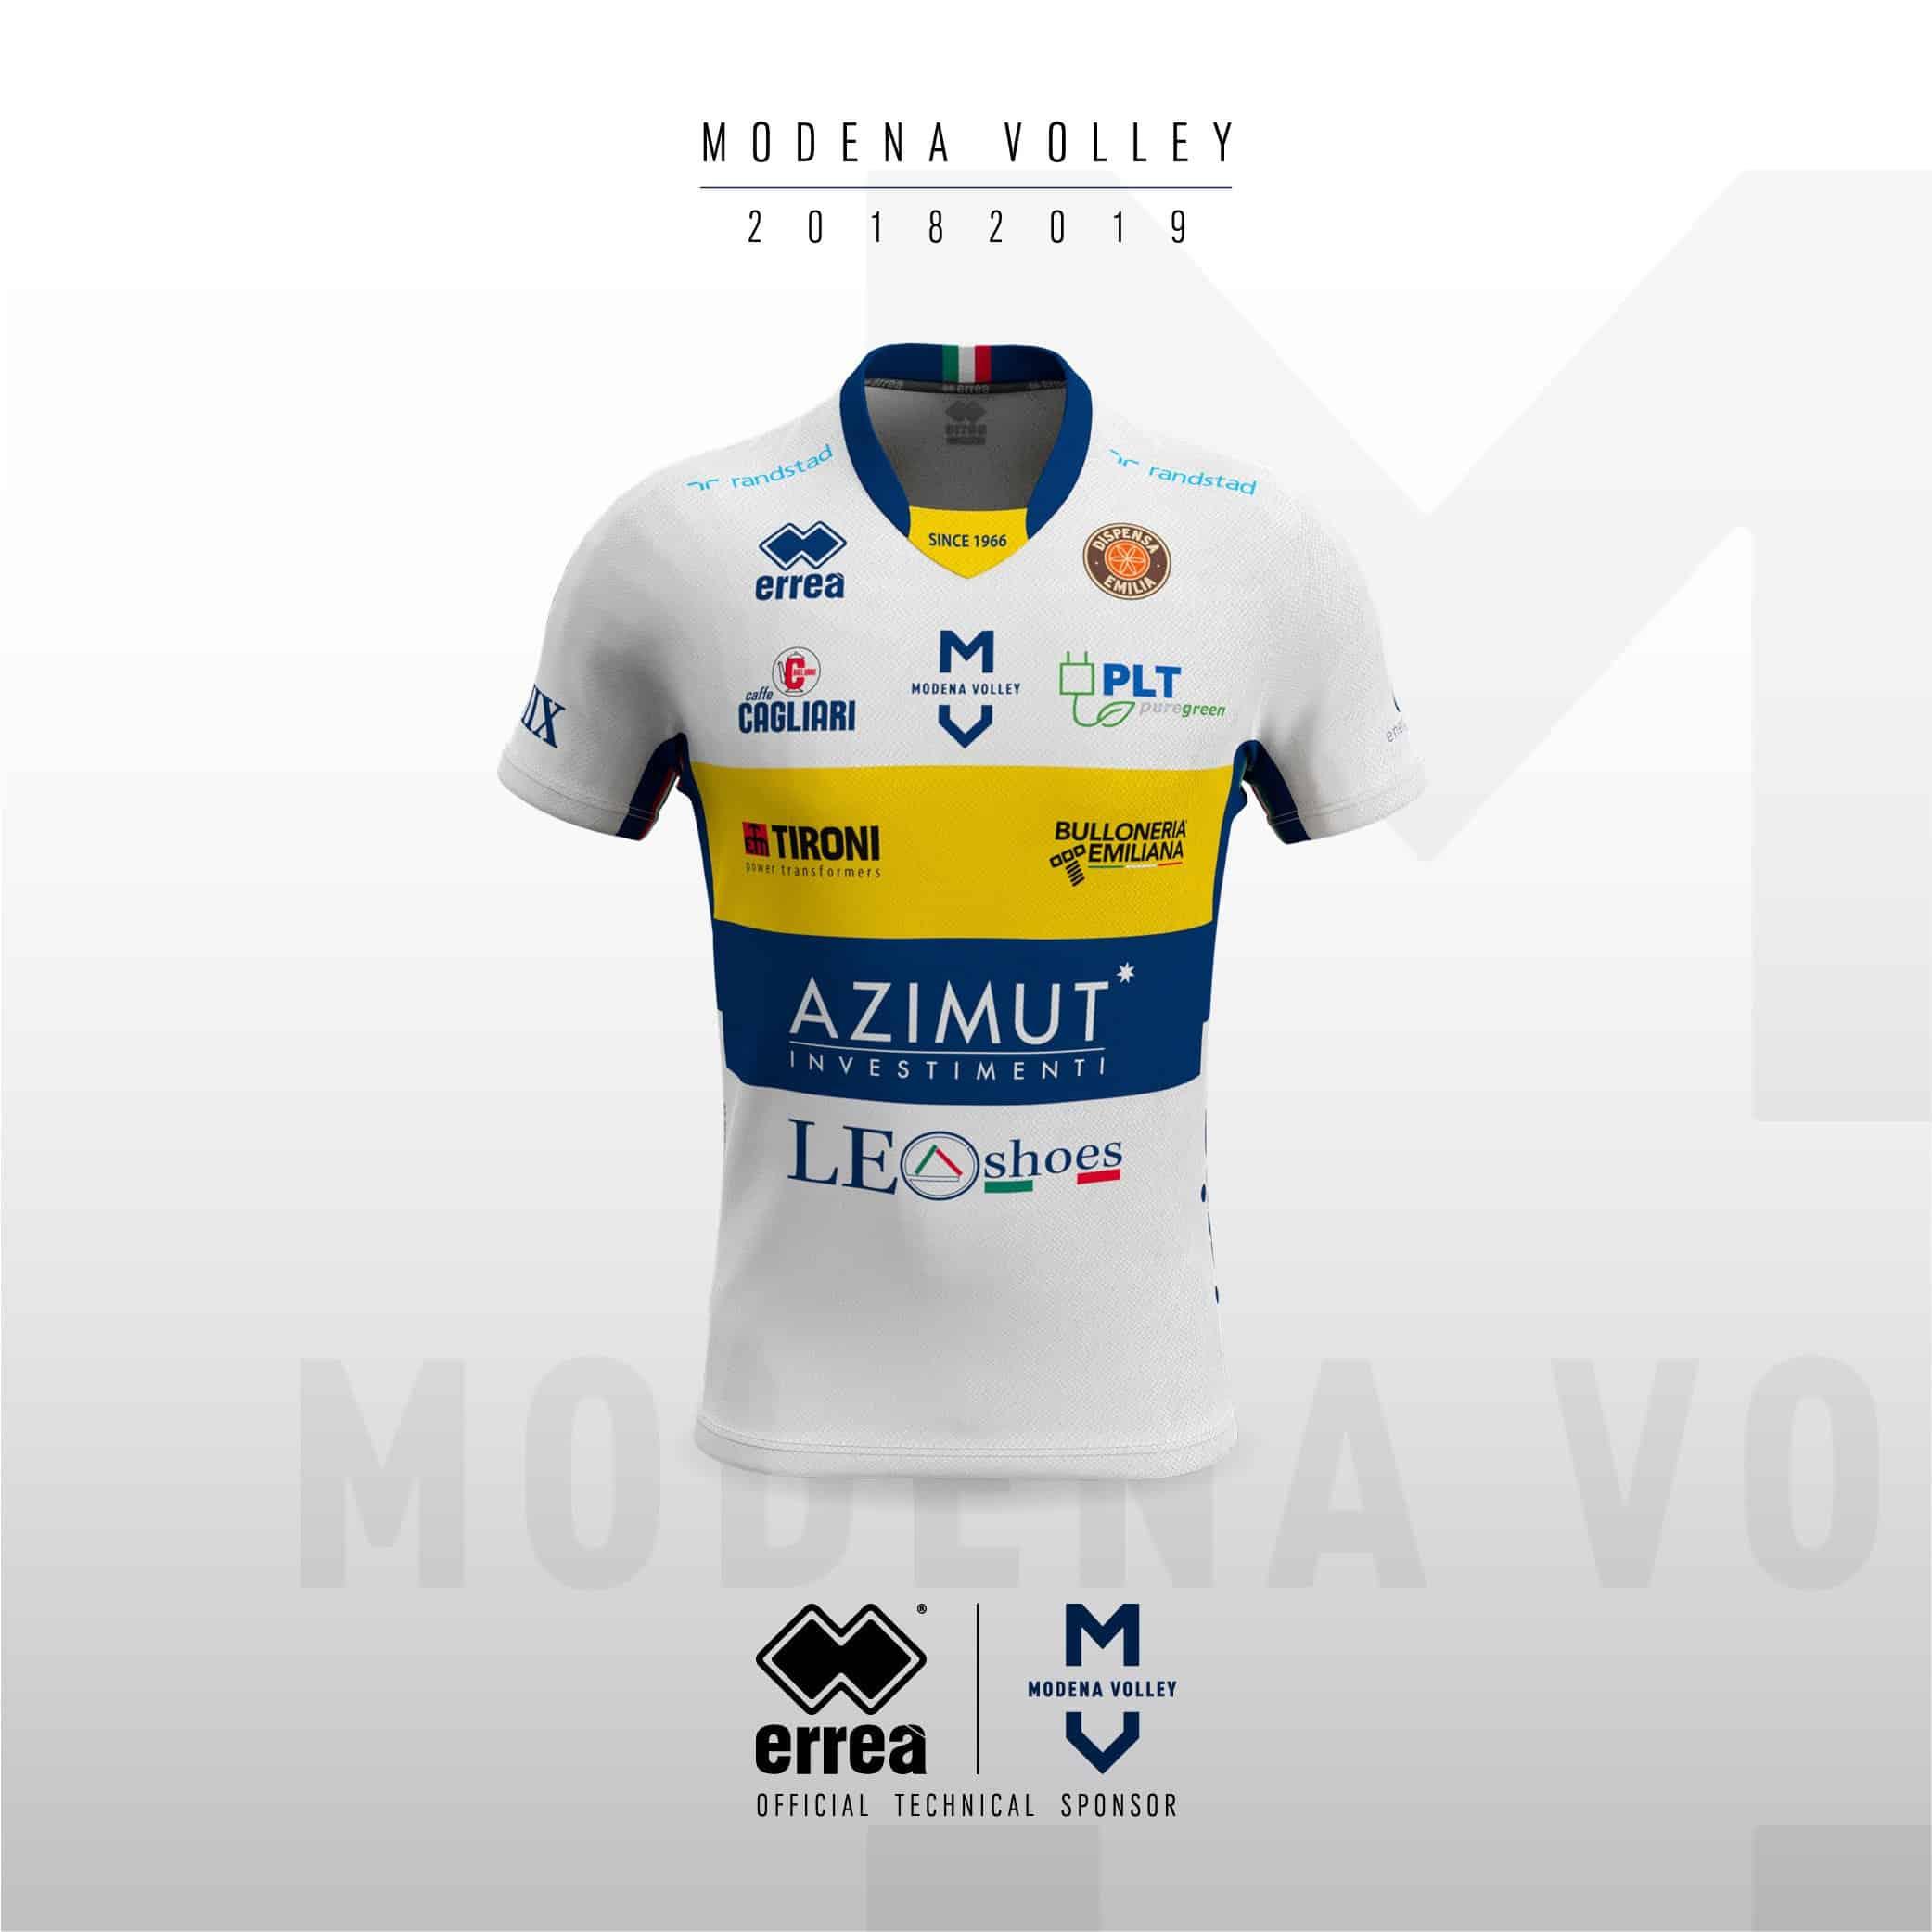 nouveau-maillot-volley-modena-italie-errea-2018-2019-3